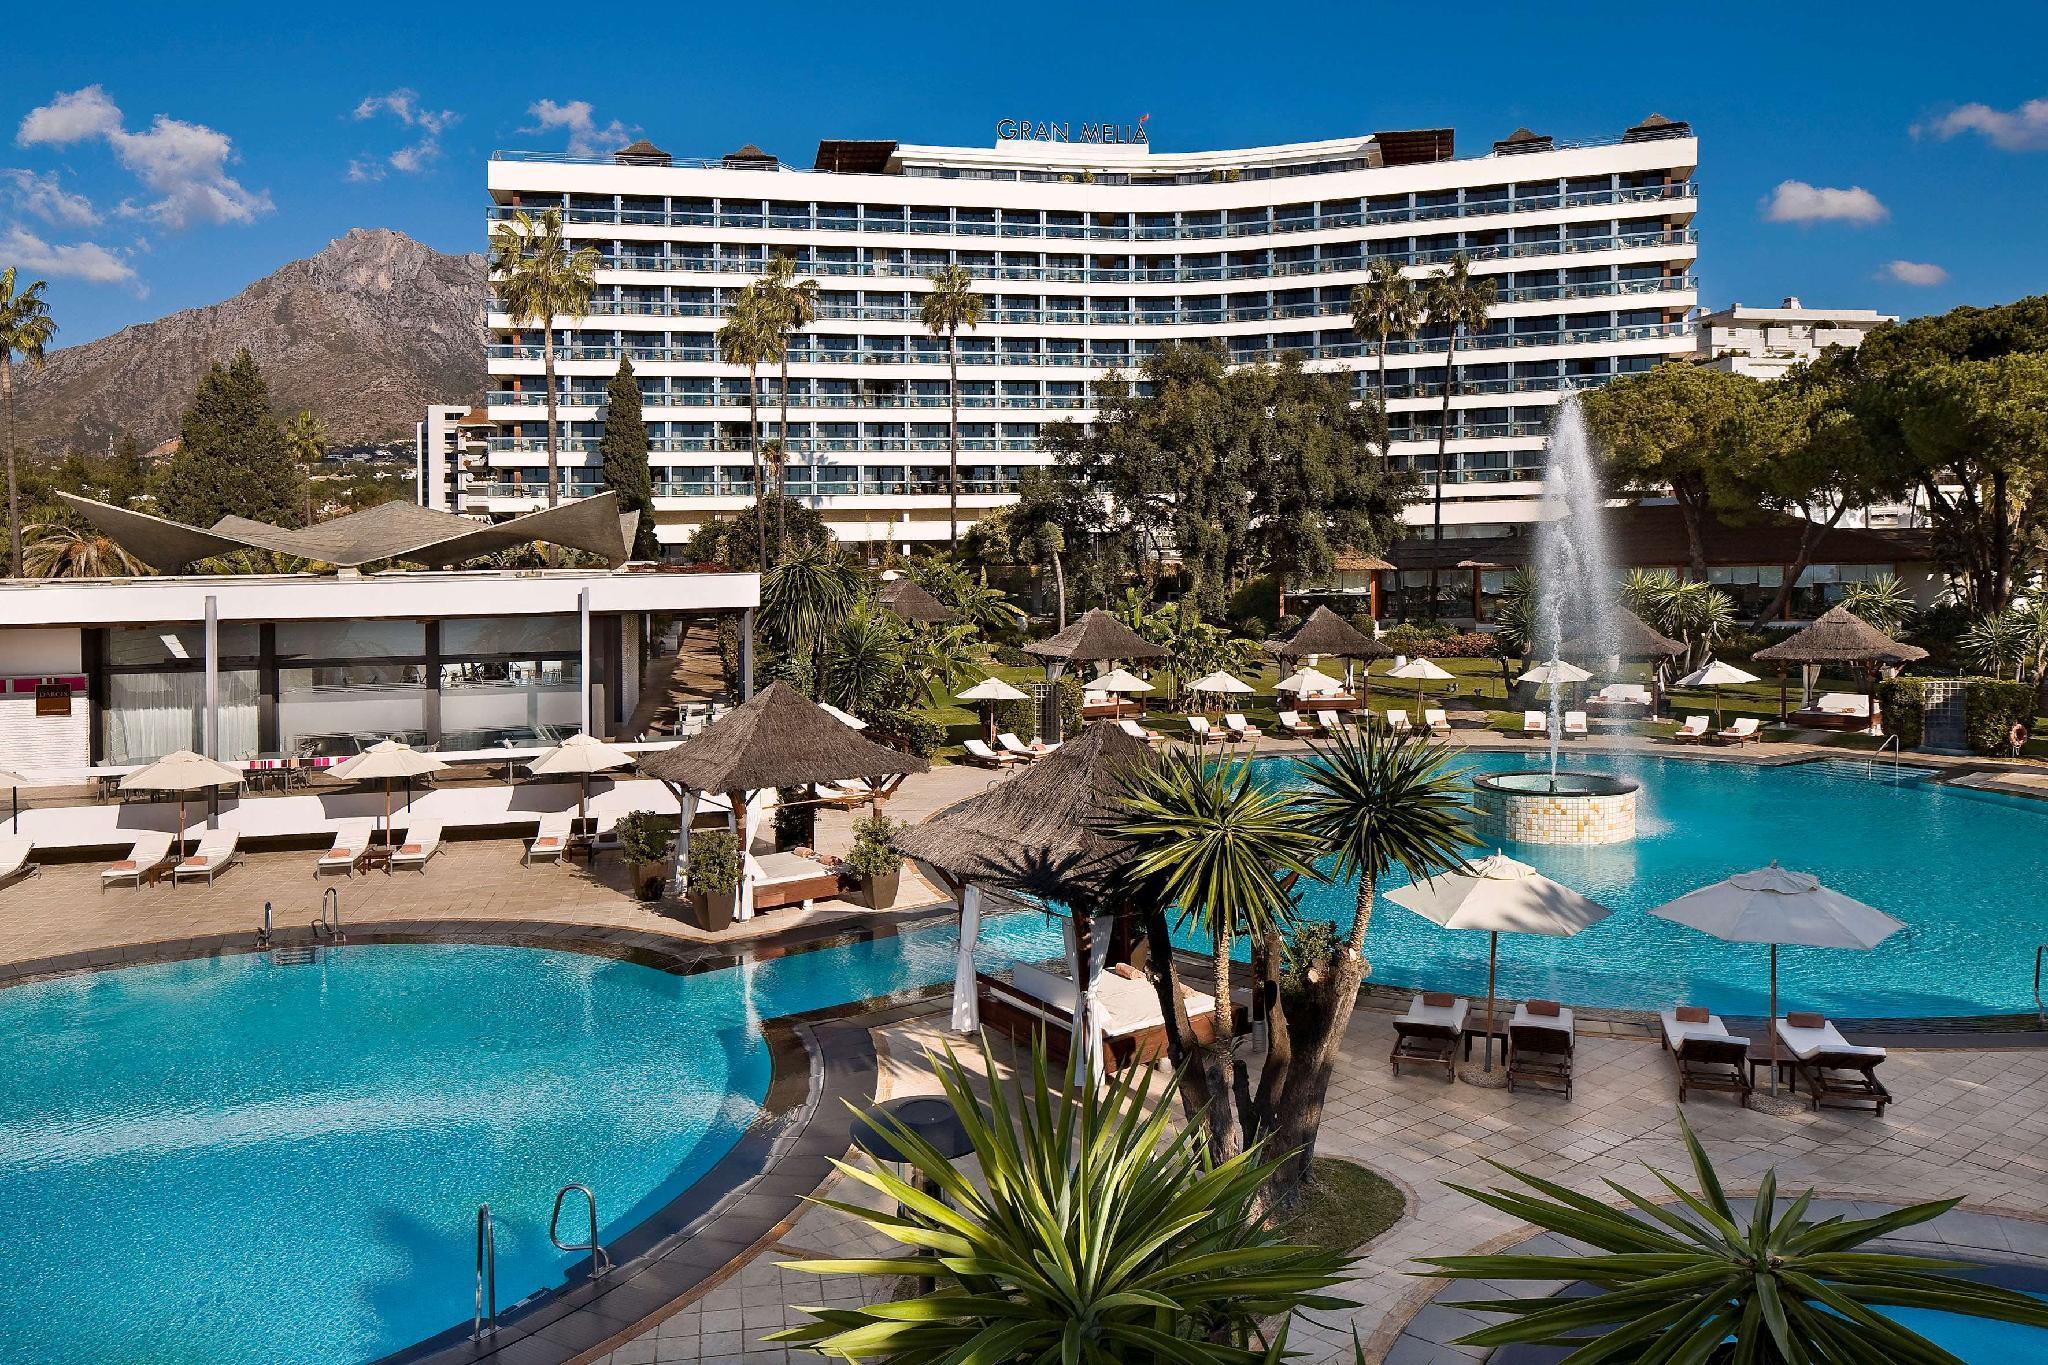 Hotel Don Pepe Gran Melia